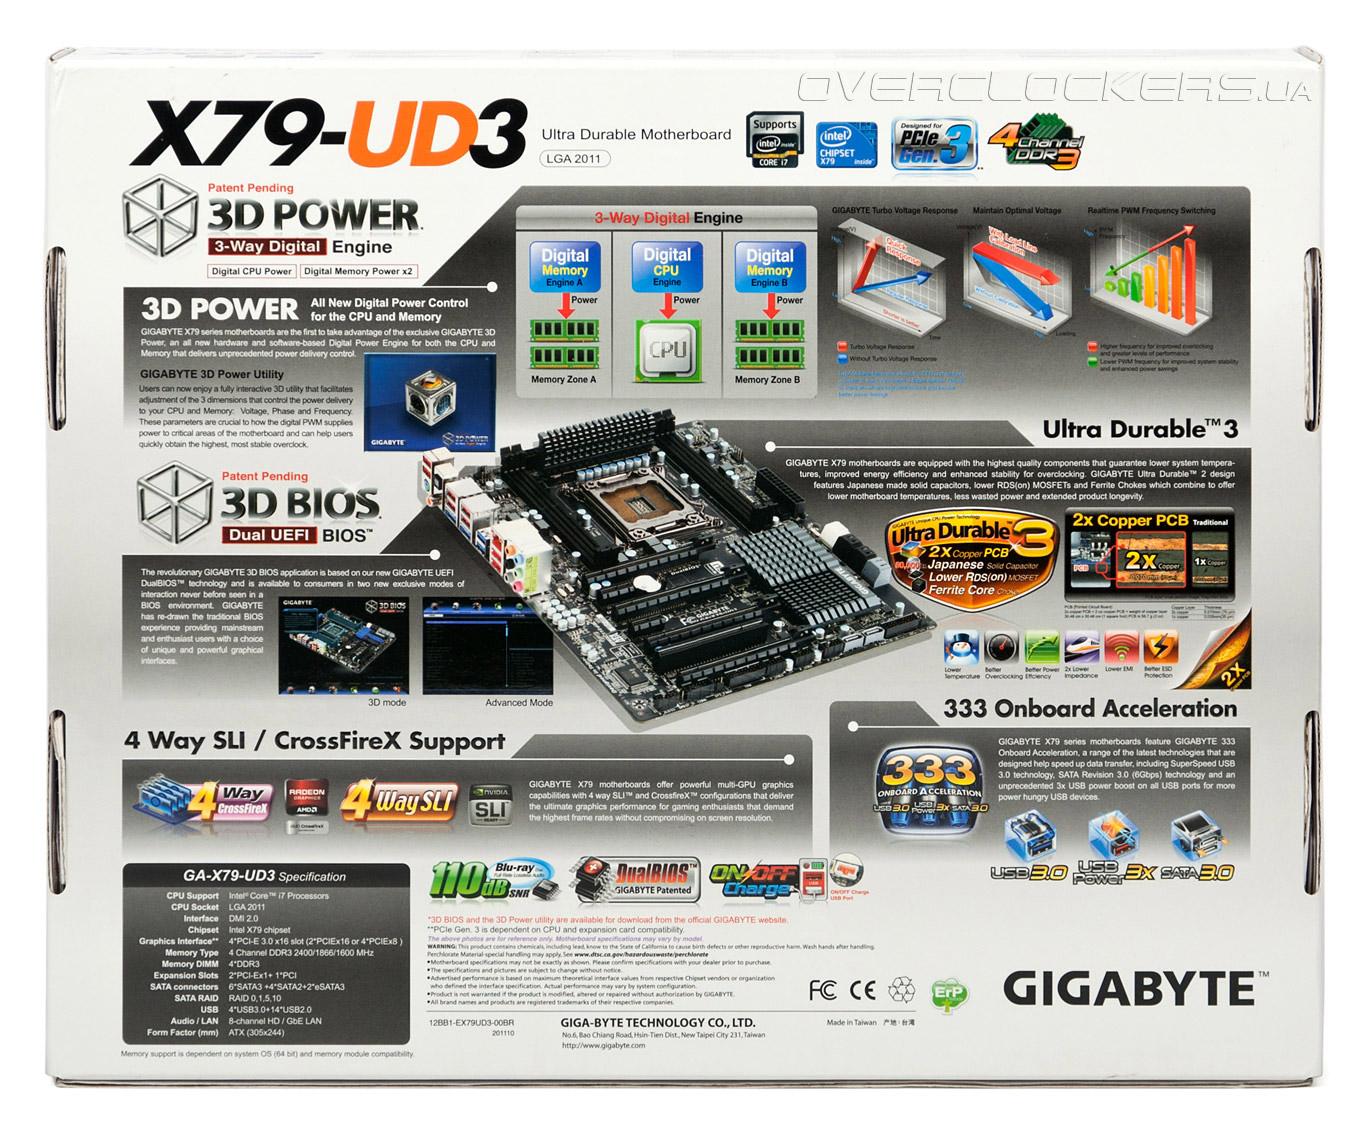 Материнская плата M/B GigaByte GA-X79-UD3 rev1.0 (RTL) LGA2011 X79 4xPCI-E+GbLAN SATA RAID ATX 4DDR-III.